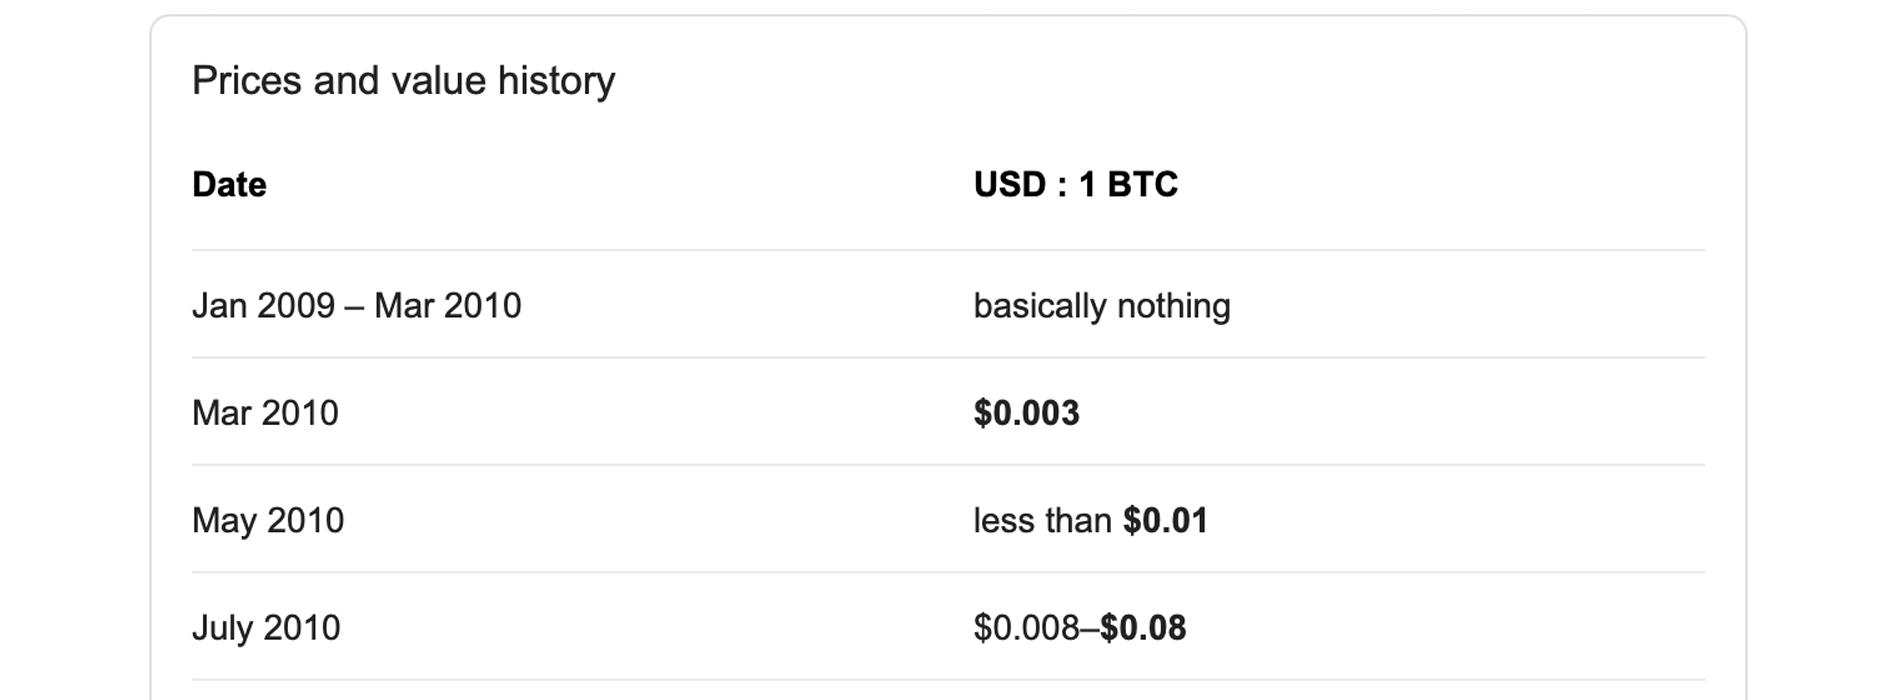 "Bitcoin ganó 8.9 millones por ciento durante la última década ""ancho ="" 1900 ""height ="" 700 ""srcset ="" https://blackswanfinances.com/wp-content/uploads/2019/12/basicallynothing.jpg 1900w, https://news.bitcoin.com/wp-content/uploads /2019/12/basicallynothing-300x111.jpg 300w, https://news.bitcoin.com/wp-content/uploads/2019/12/basicallynothing-1024x377.jpg 1024w, https://news.bitcoin.com/wp -content / uploads / 2019/12 / basicallynothing-768x283.jpg 768w, https://news.bitcoin.com/wp-content/uploads/2019/12/basicallynothing-1536x566.jpg 1536w, https: //news.bitcoin .com / wp-content / uploads / 2019/12 / basicallynothing-696x256.jpg 696w, https://news.bitcoin.com/wp-content/uploads/2019/12/basicallynothing-1392x513.jpg 1392w, https: / /news.bitcoin.com/wp-content/uploads/2019/12/basicallynothing-1068x393.jpg 1 068w, https://news.bitcoin.com/wp-content/uploads/2019/12/basicallynothing-1140x420.jpg 1140w ""tamaños ="" (ancho máximo: 1900px) 100vw, 1900px"